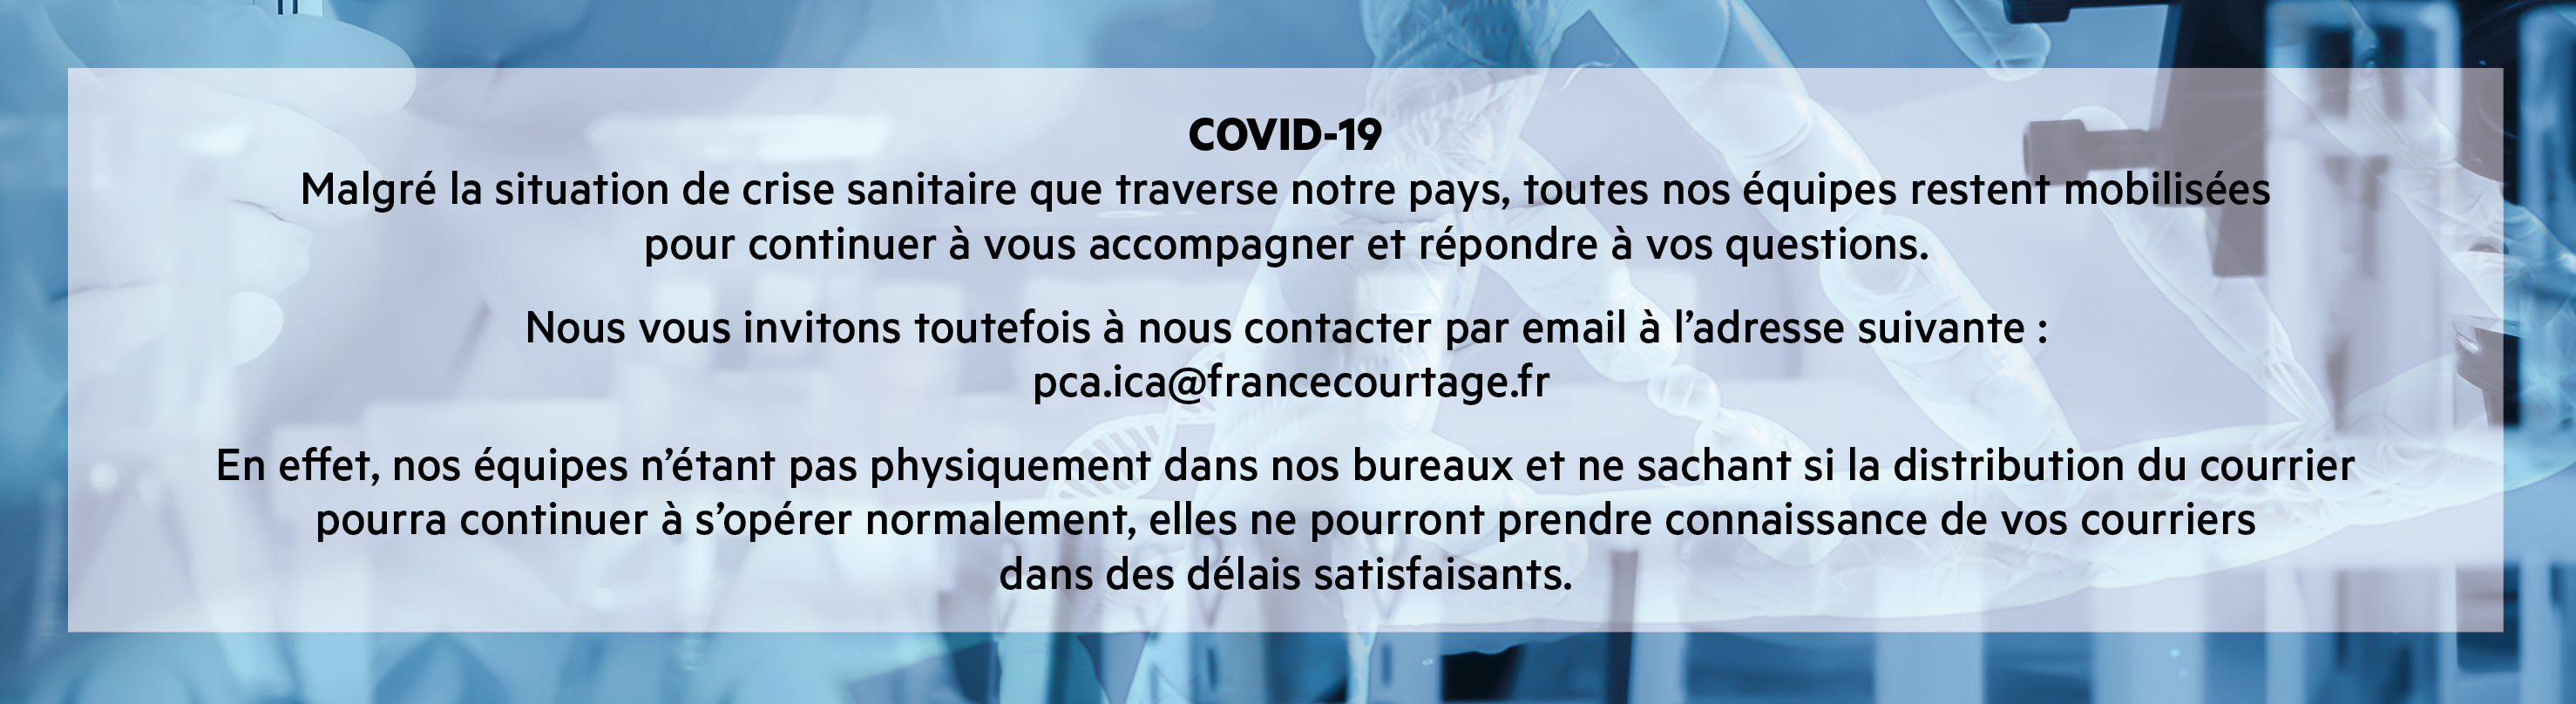 GFC-COVID19-pca-ica